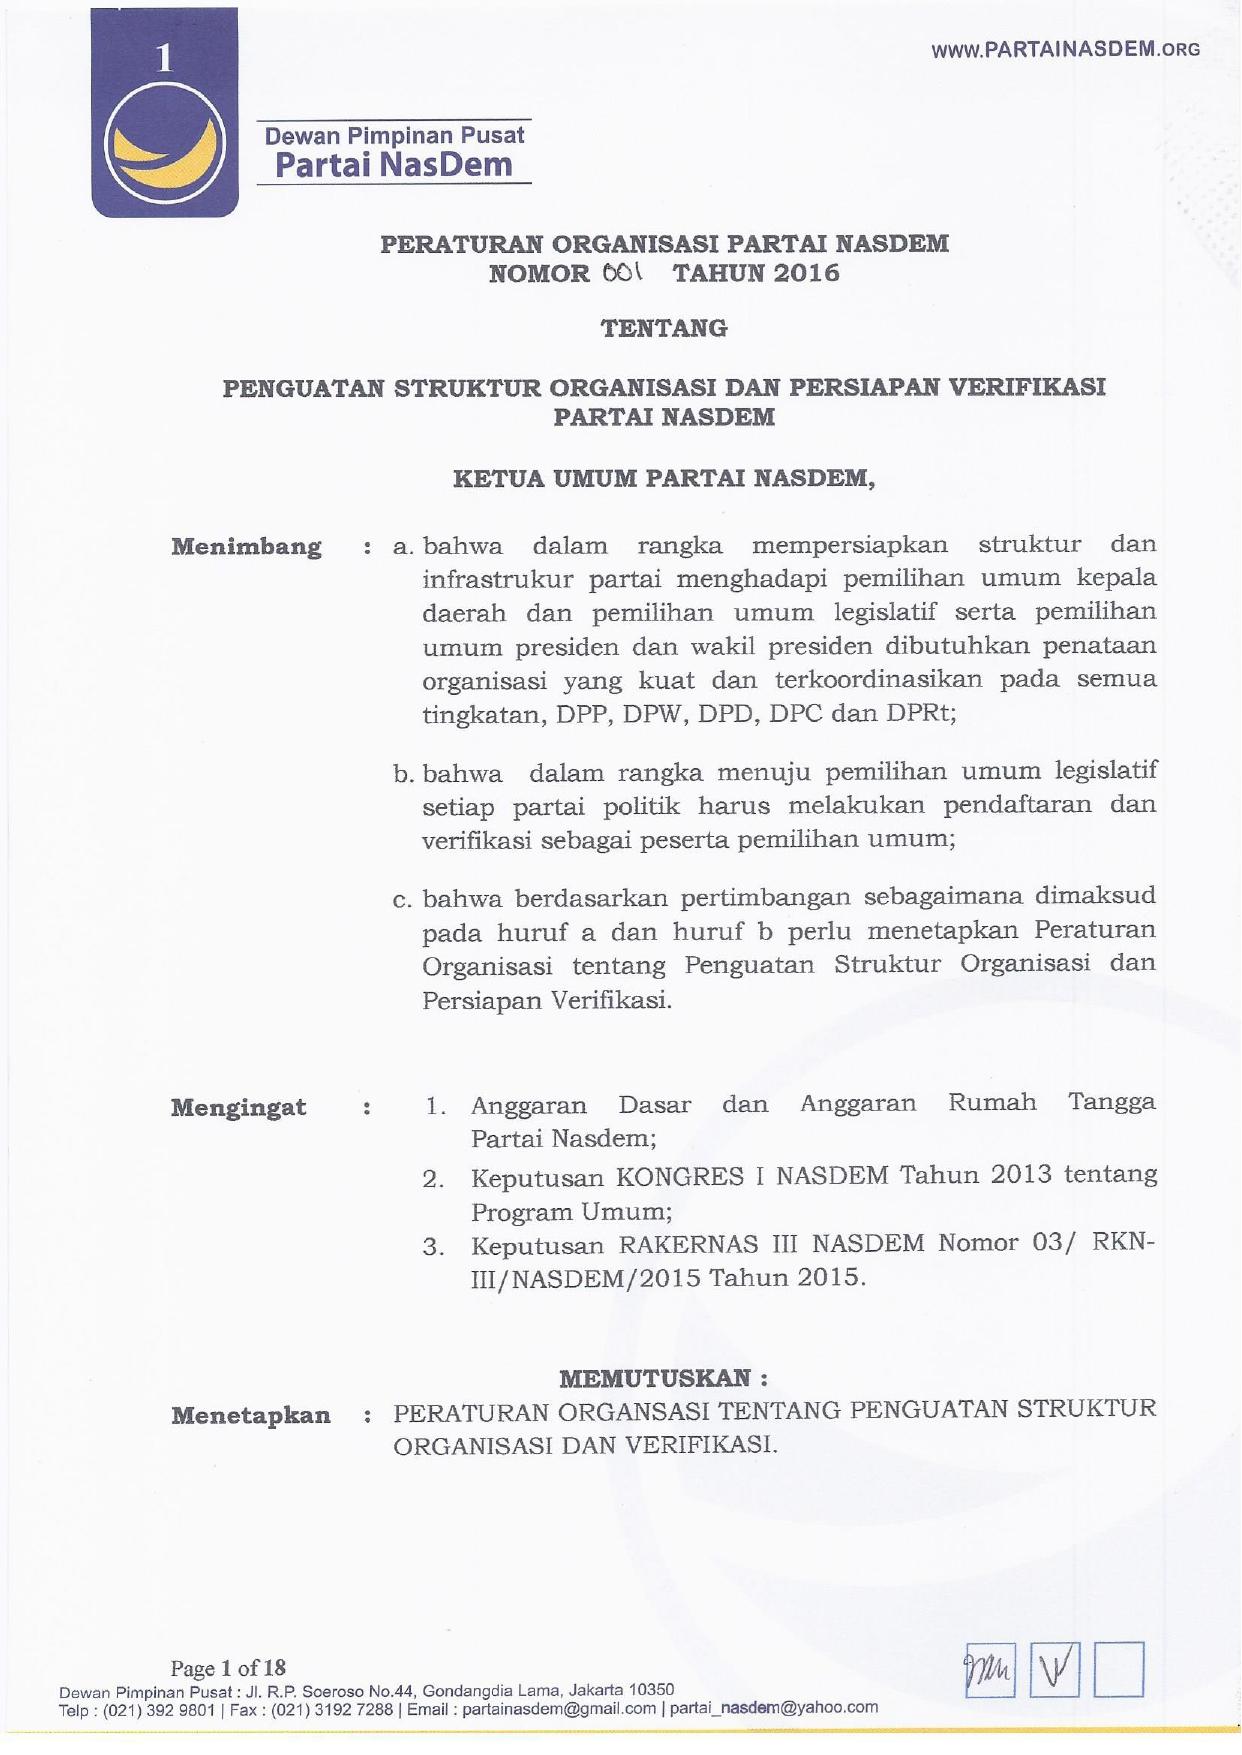 2016_PO no 01 PENGUATAN STRUKTUR DAN PERSIAPAN VERIFIKASI_page-0001